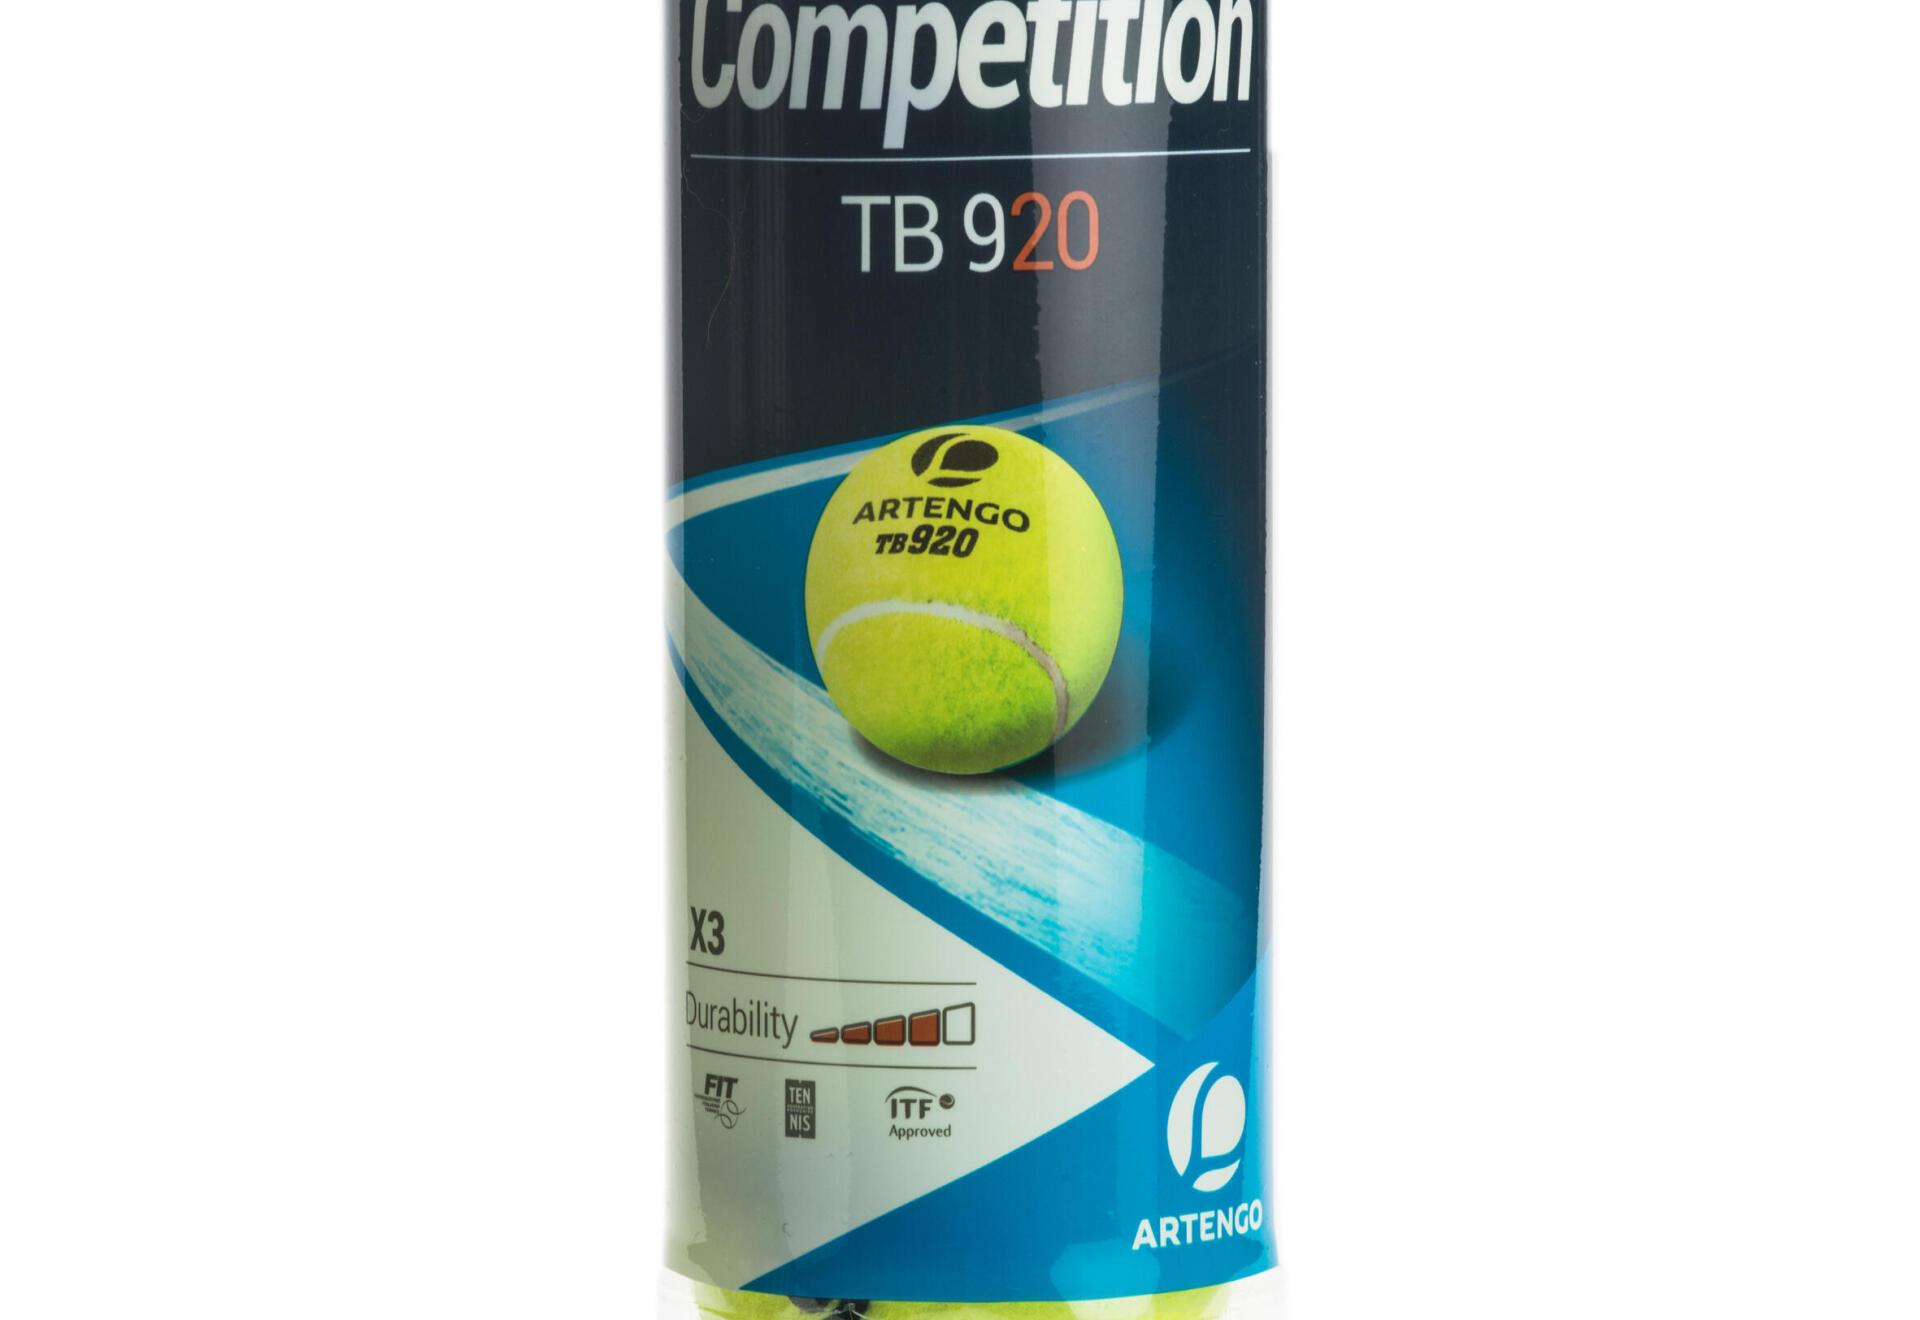 tb920 canned tennis pressurised ball